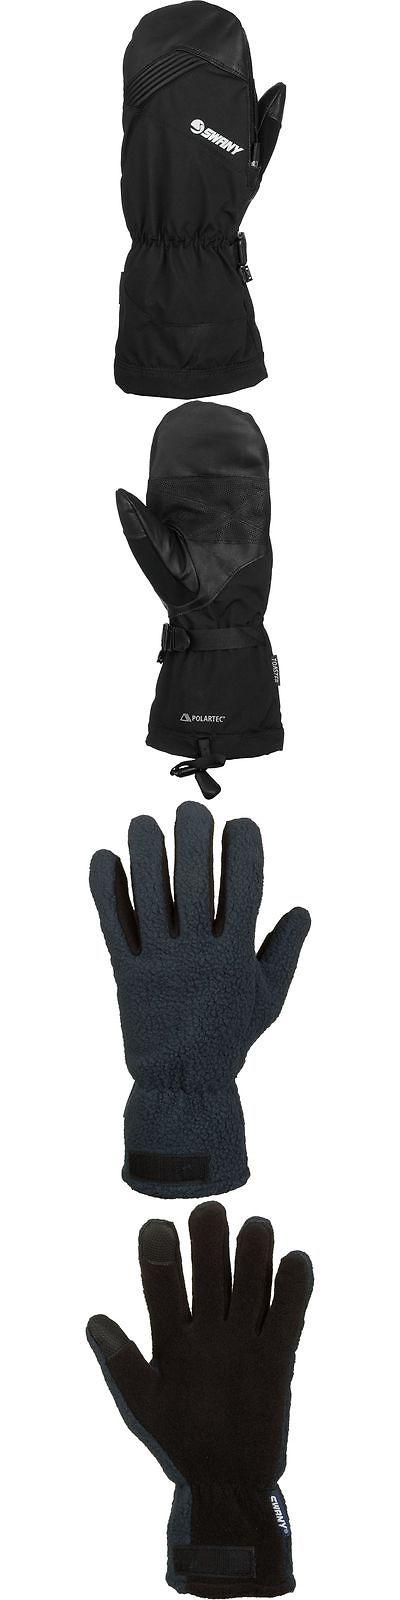 arctic mens com sports outdoors black s small amazon mittens swany ts mitt men dp toaster